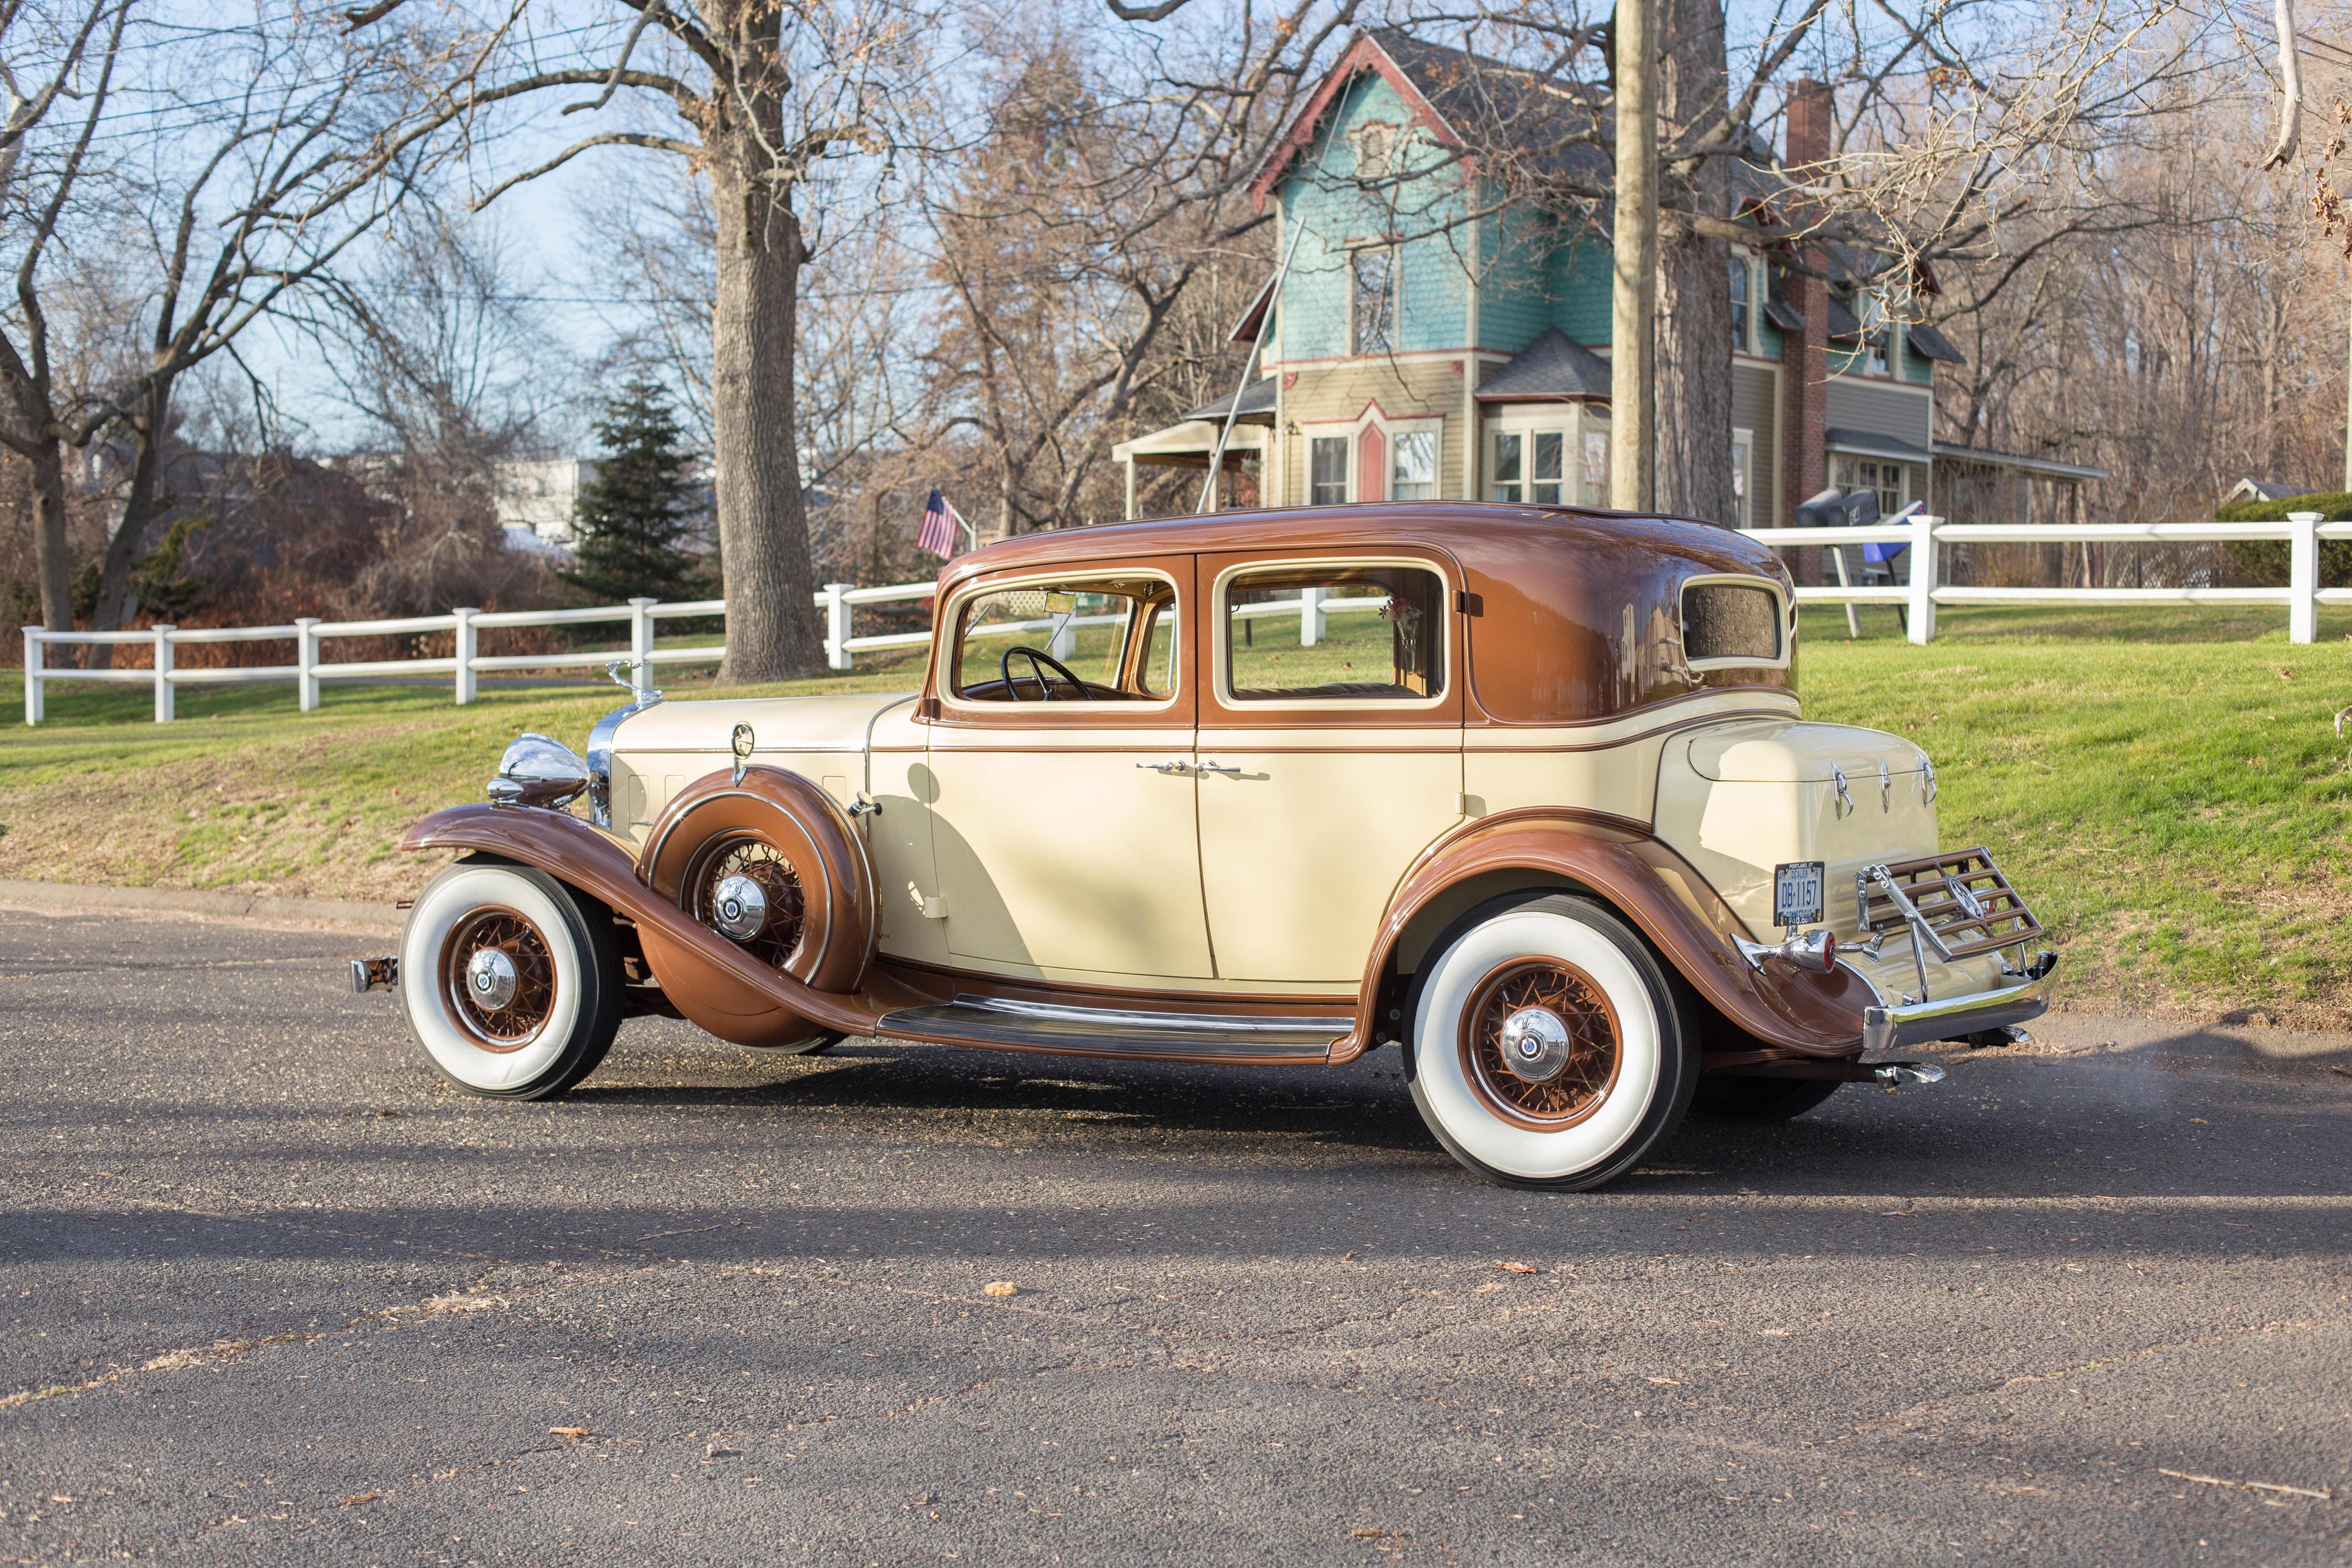 Картинка Cadillac 1932 V12 370-B Town Sedan by Fisher Сбоку Автомобили 4096x2731 Кадиллак авто машины машина автомобиль